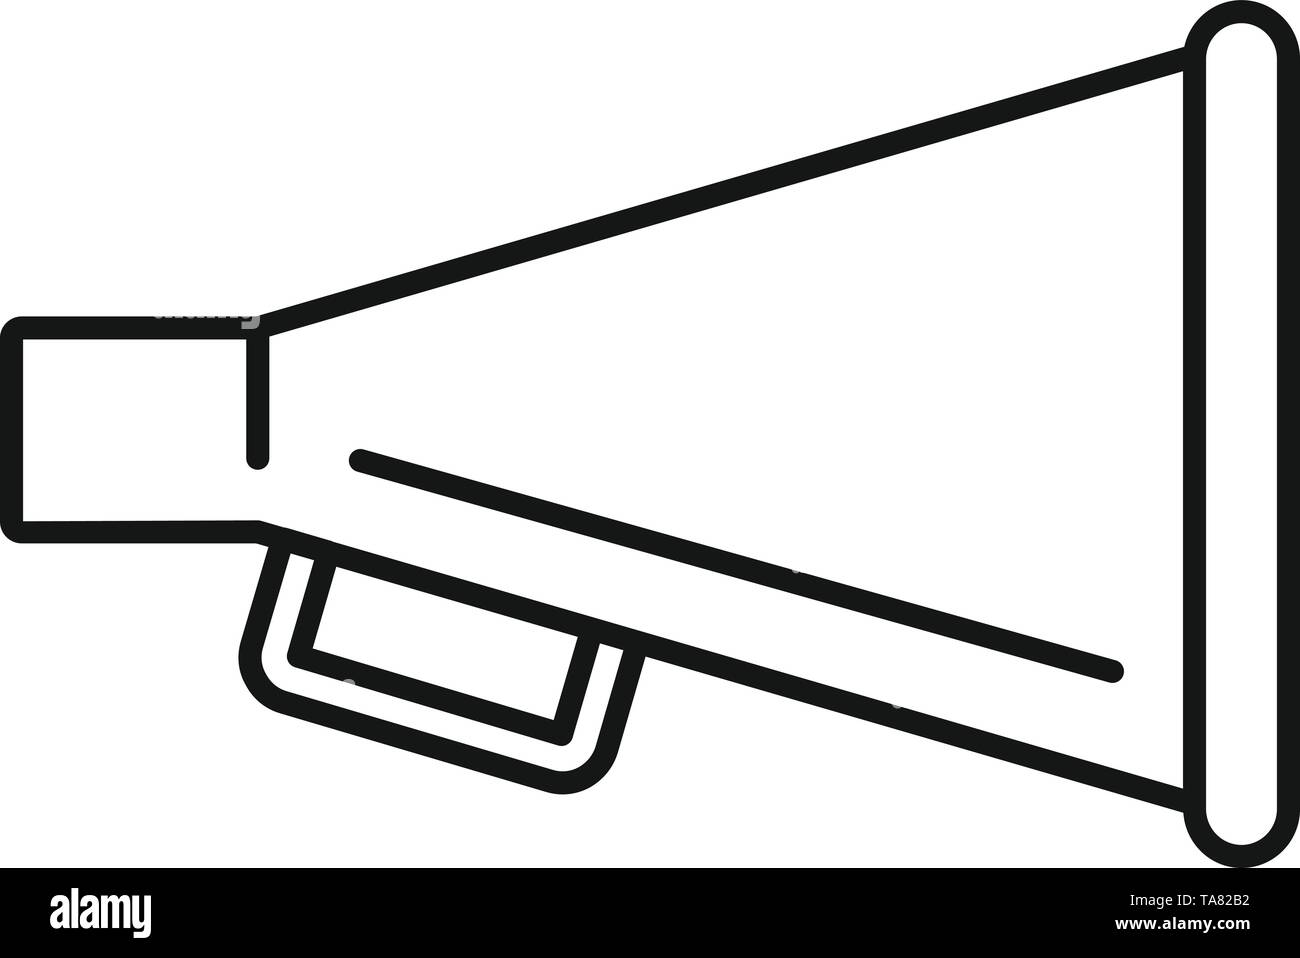 Cinema production hand speaker icon. Outline cinema production hand speaker vector icon for web design isolated on white background - Stock Image